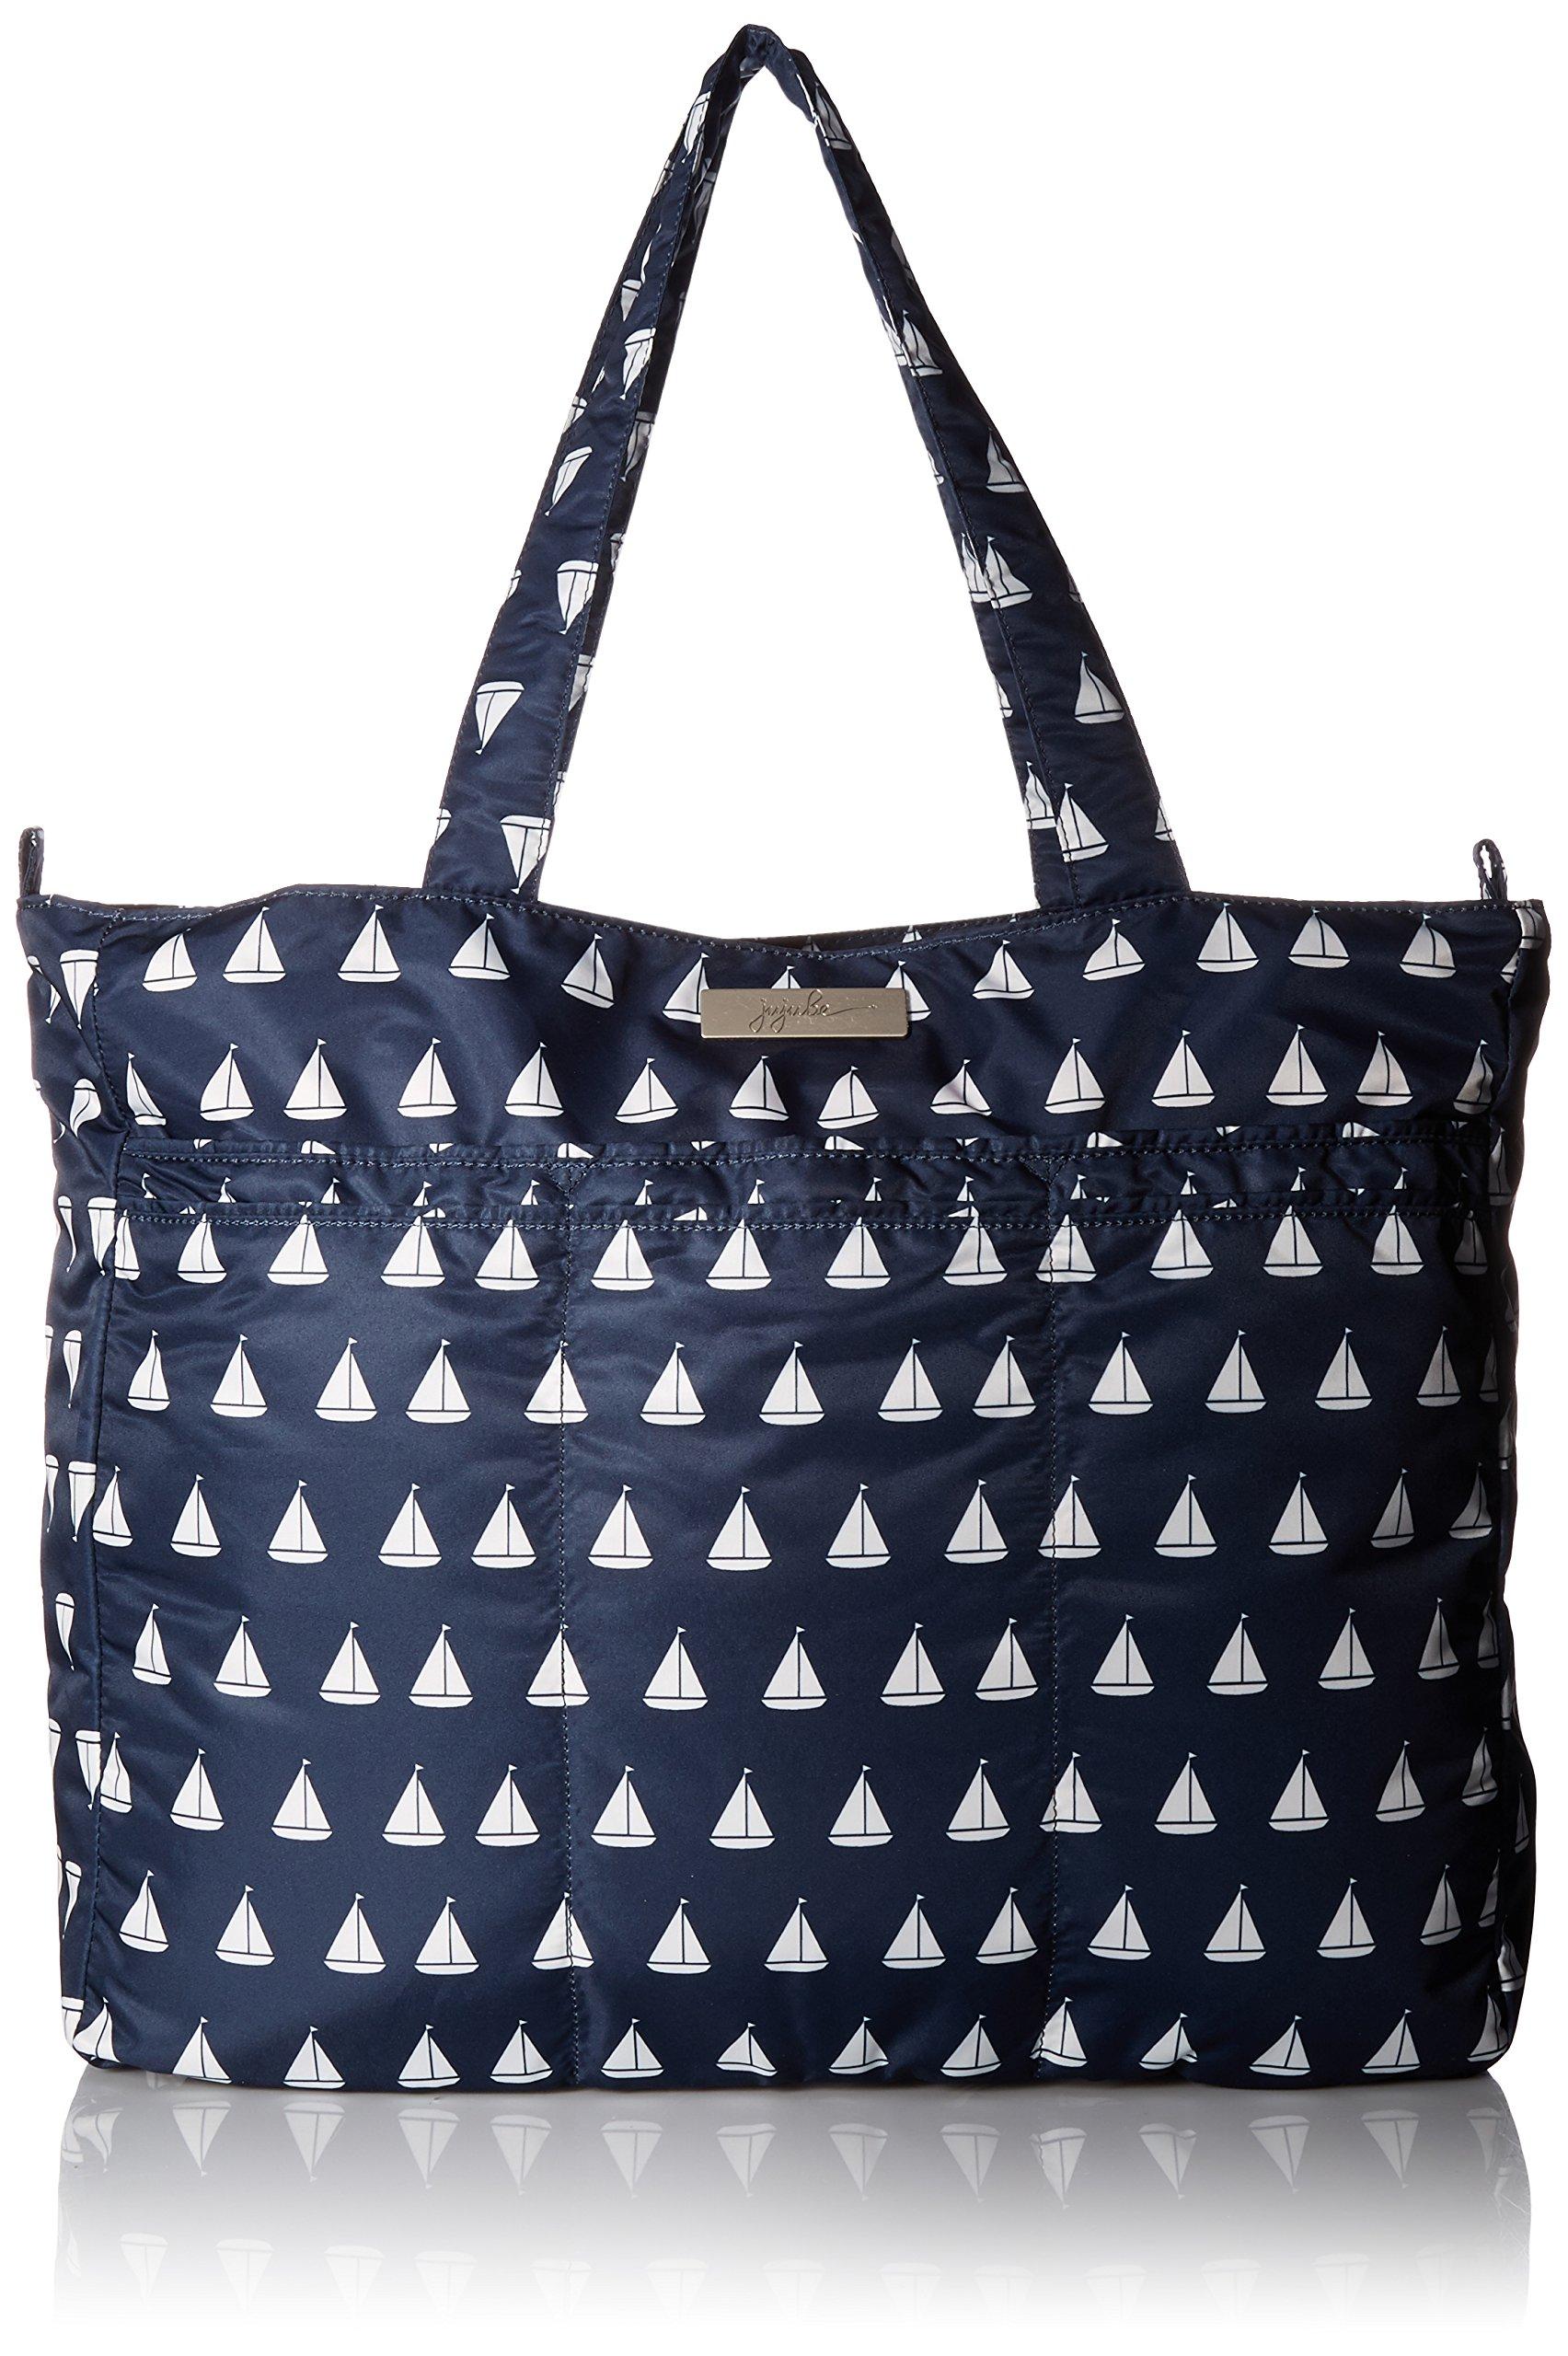 f468e9e00dca JuJuBe Super Be Large Everyday Lightweight Zippered Tote Bag